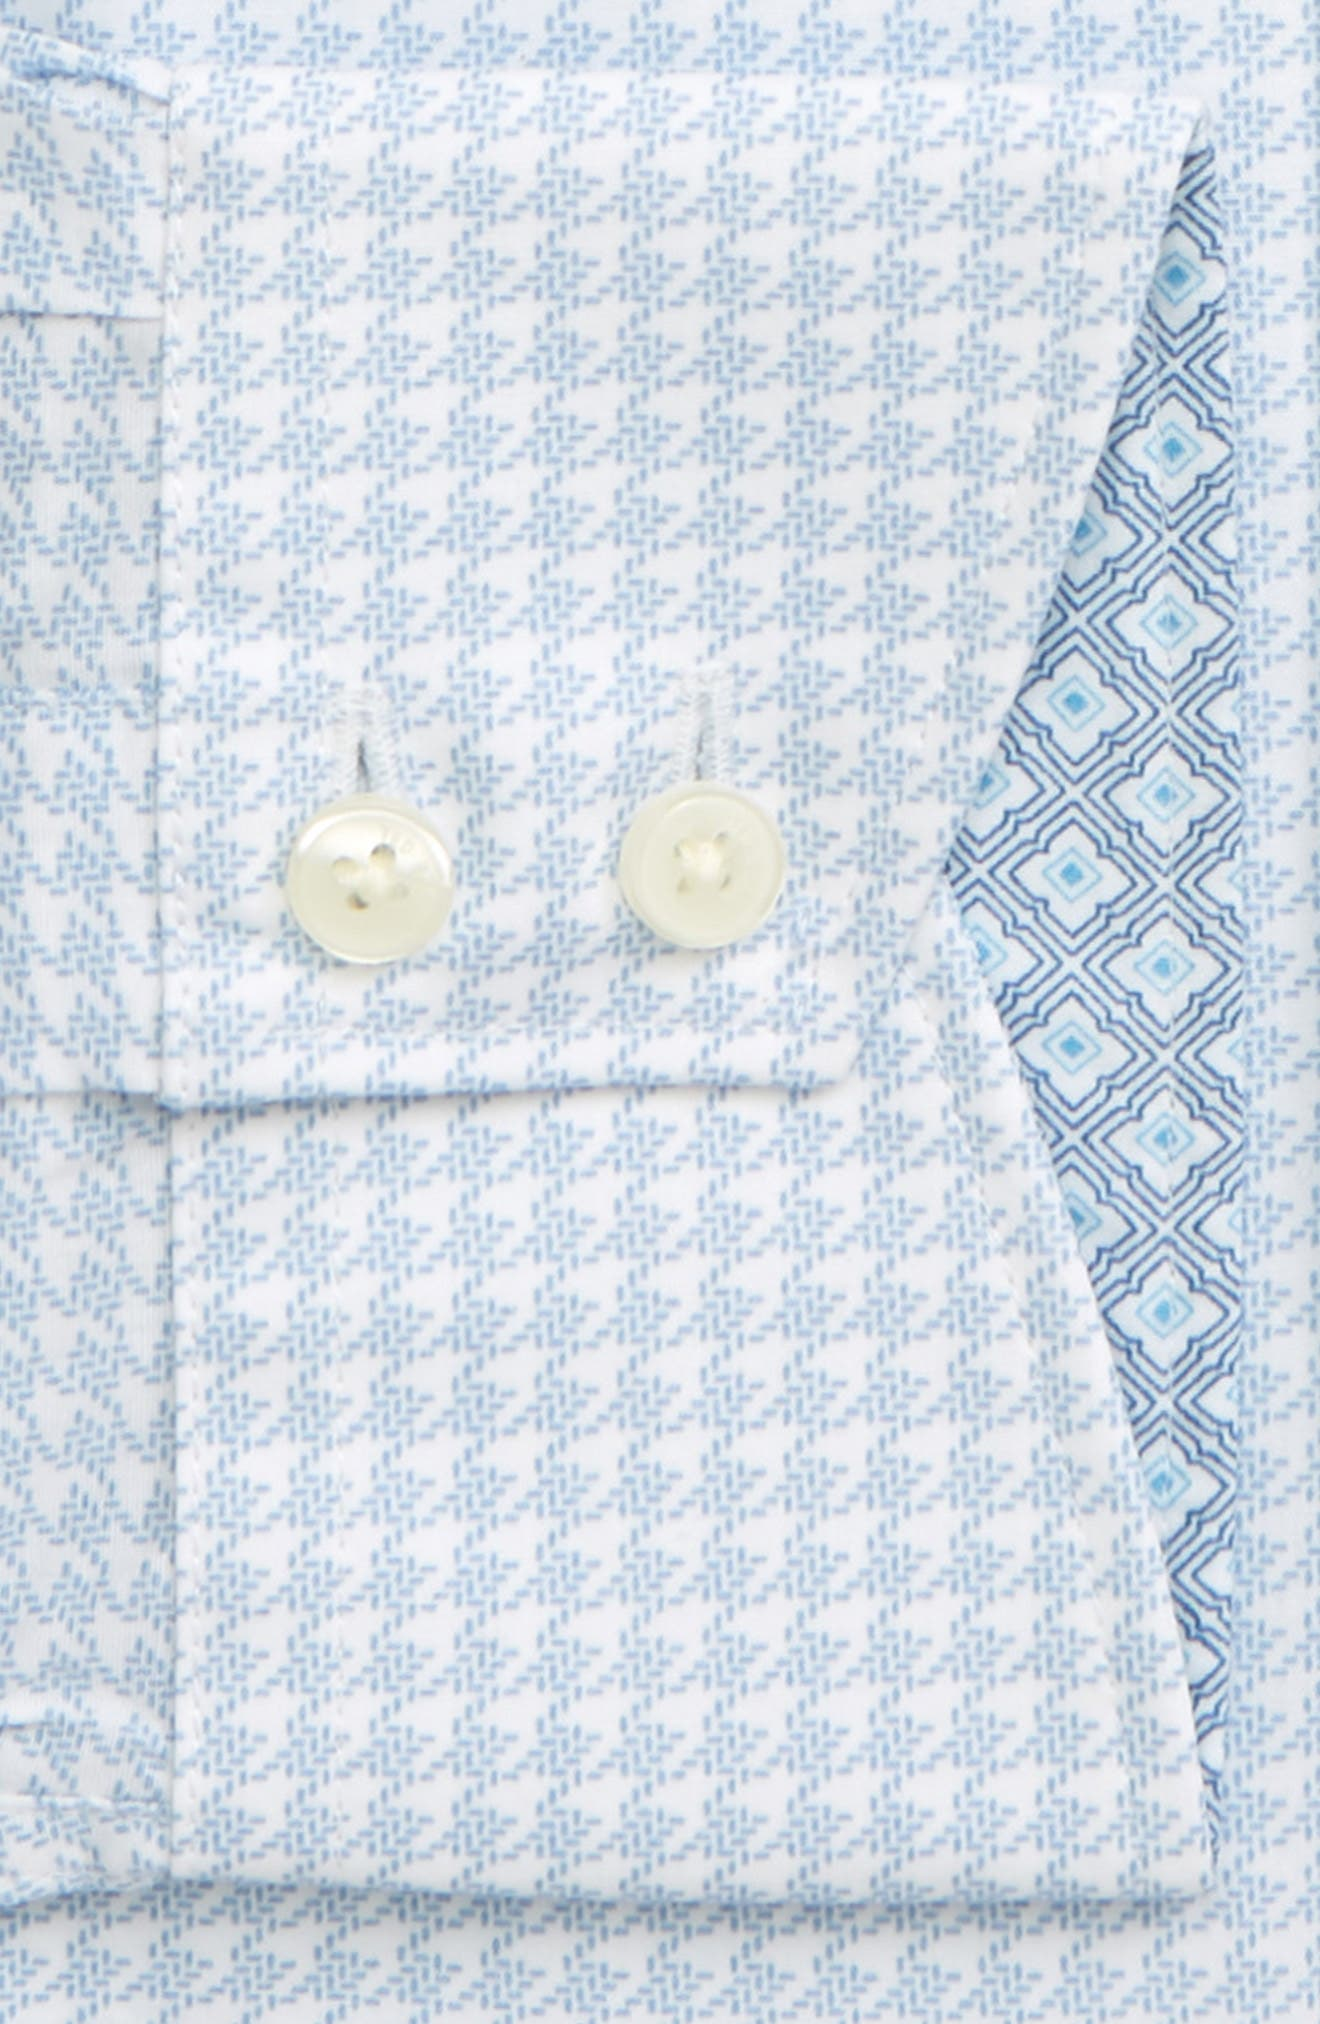 TED BAKER LONDON, Endurance Grahite Slim Fit Houndstooth Dress Shirt, Alternate thumbnail 2, color, BLUE